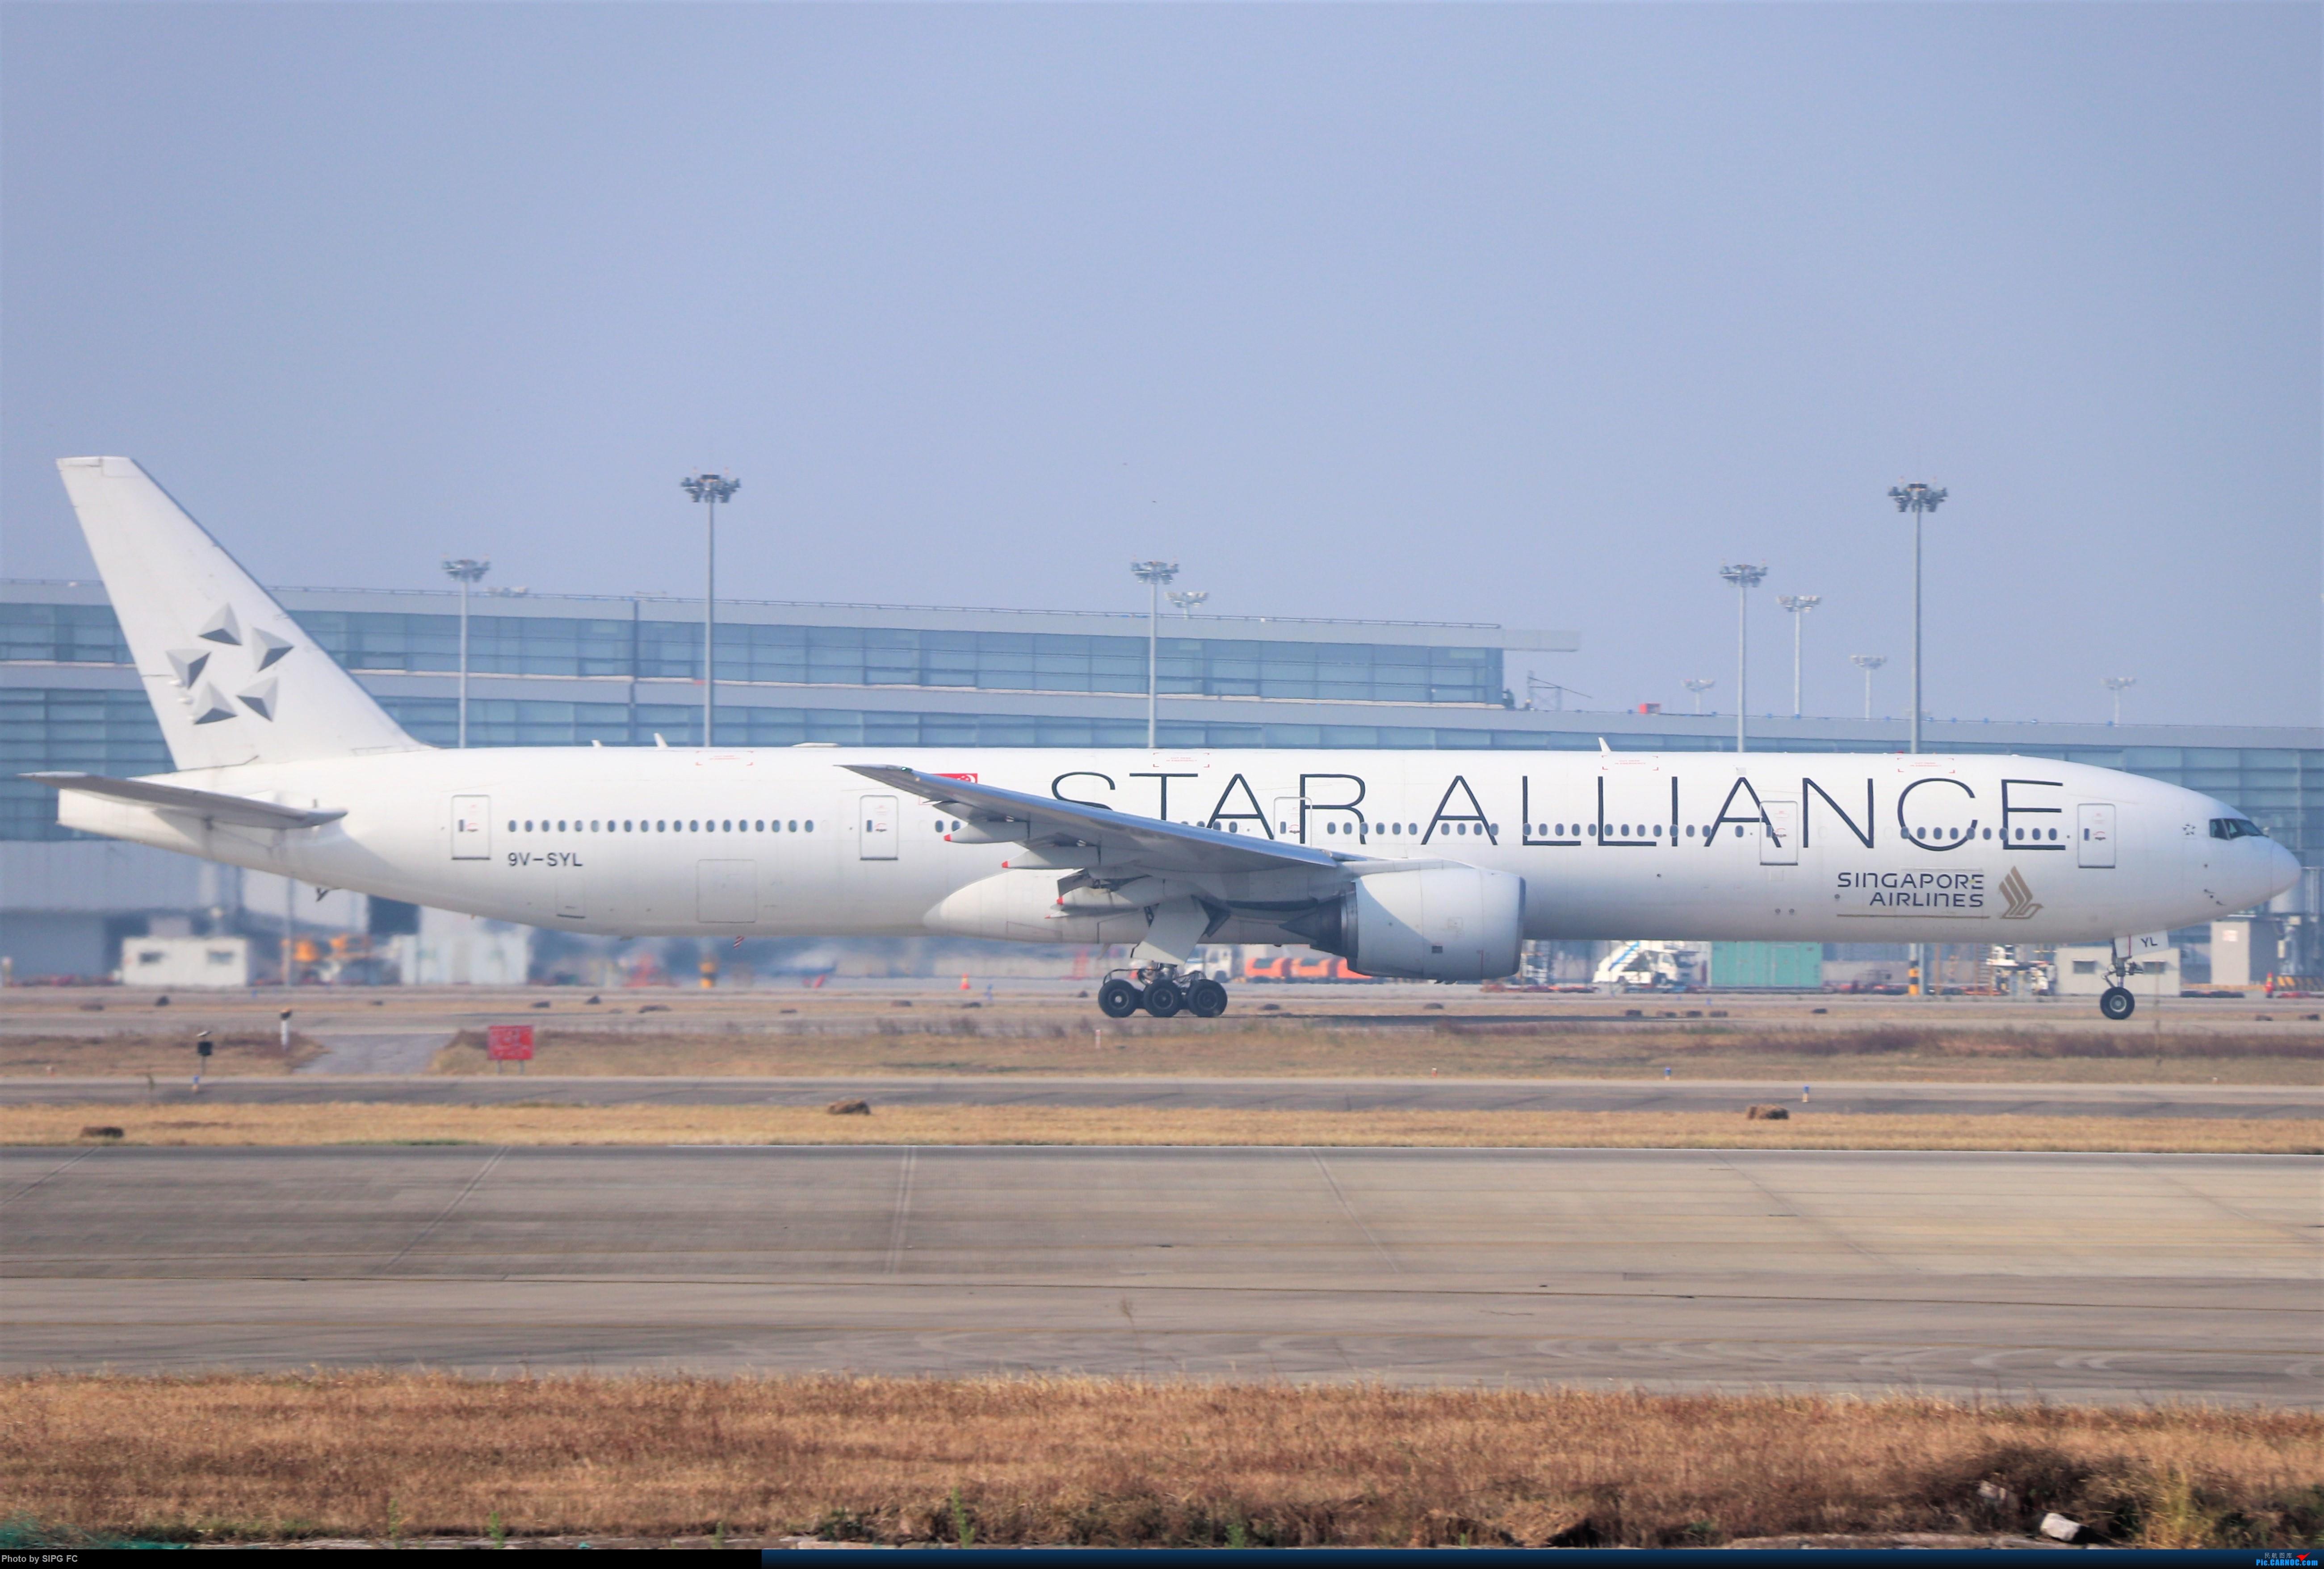 Re:[原创]清晨浓雾散去后繁忙的浦东机场 BOEING 777-300ER 9V-SYL 中国上海浦东国际机场